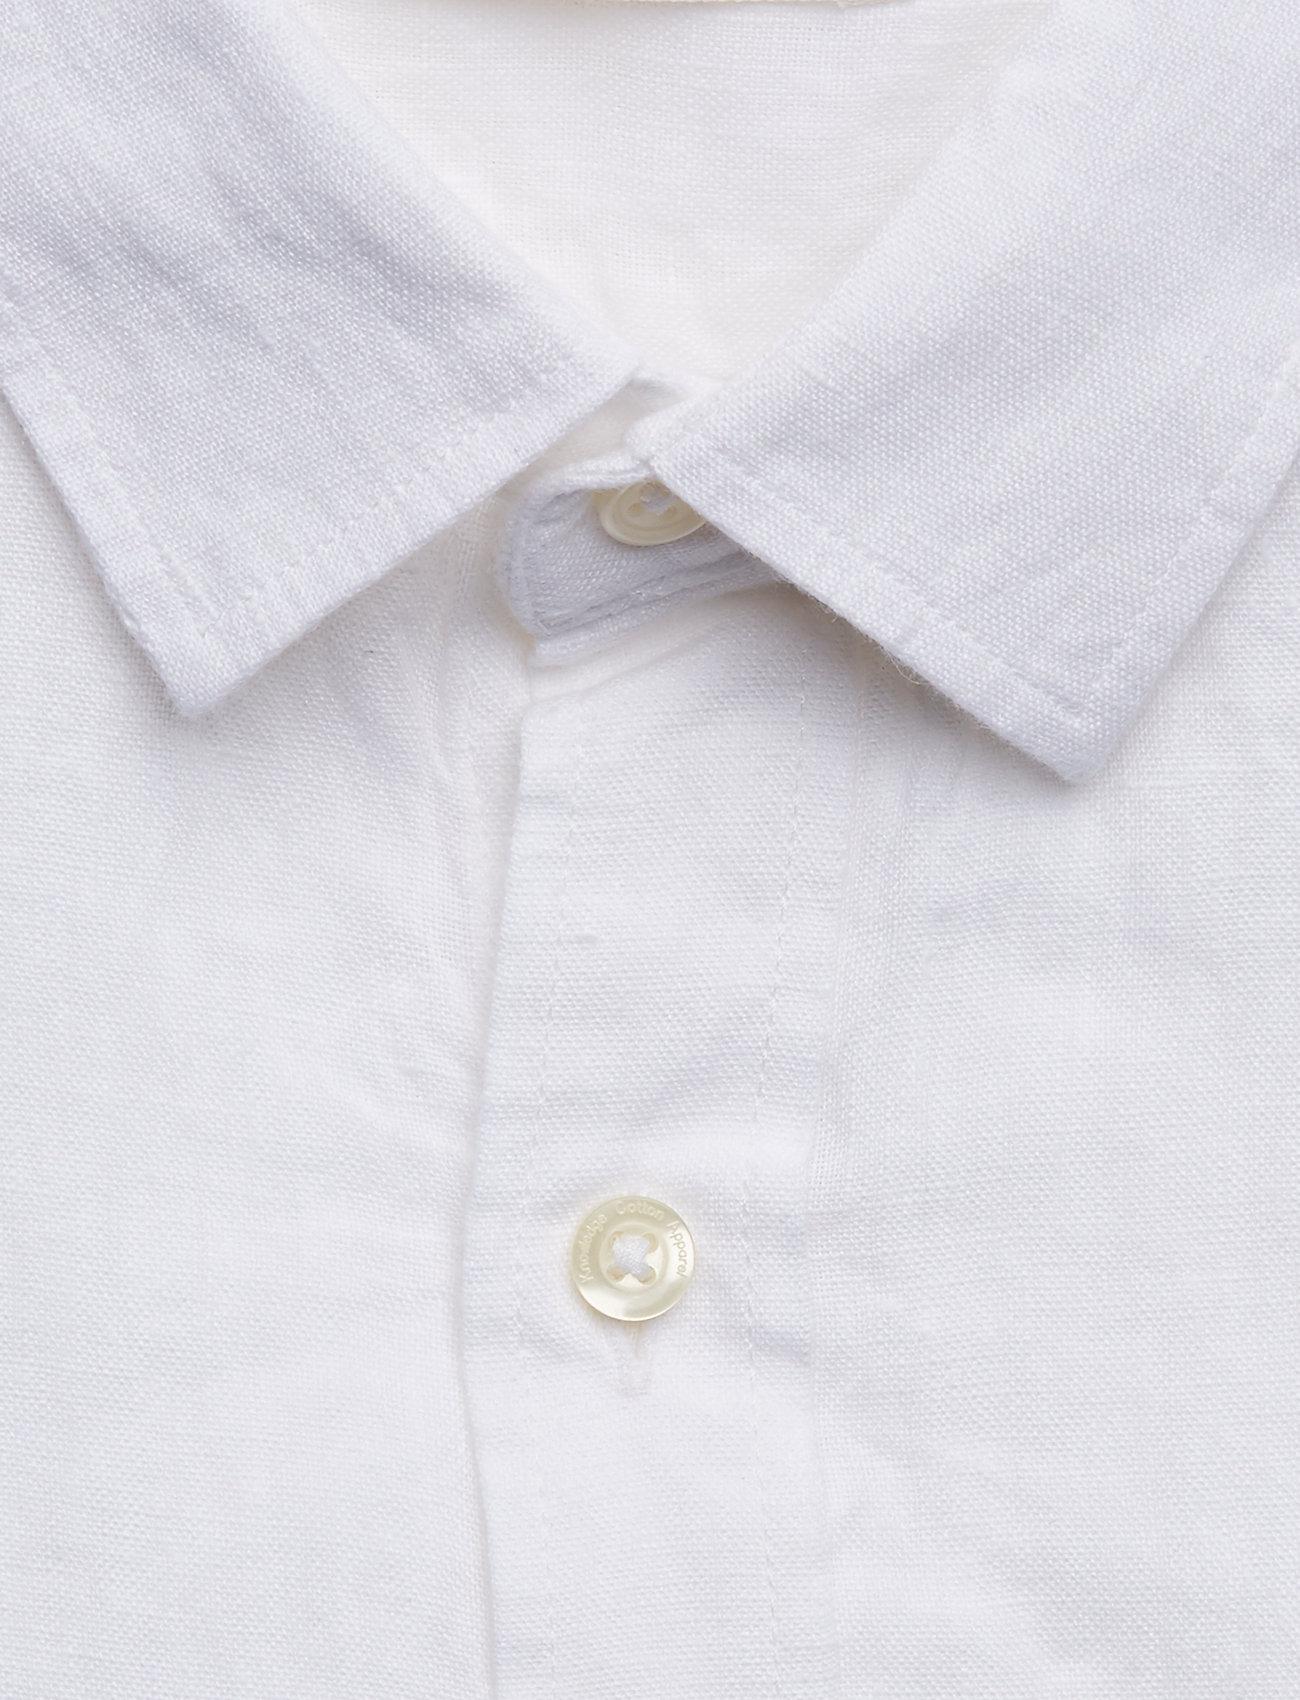 WhiteKnowledge Cotton Larch Shirtbright Apparel Ls tshxrdQC